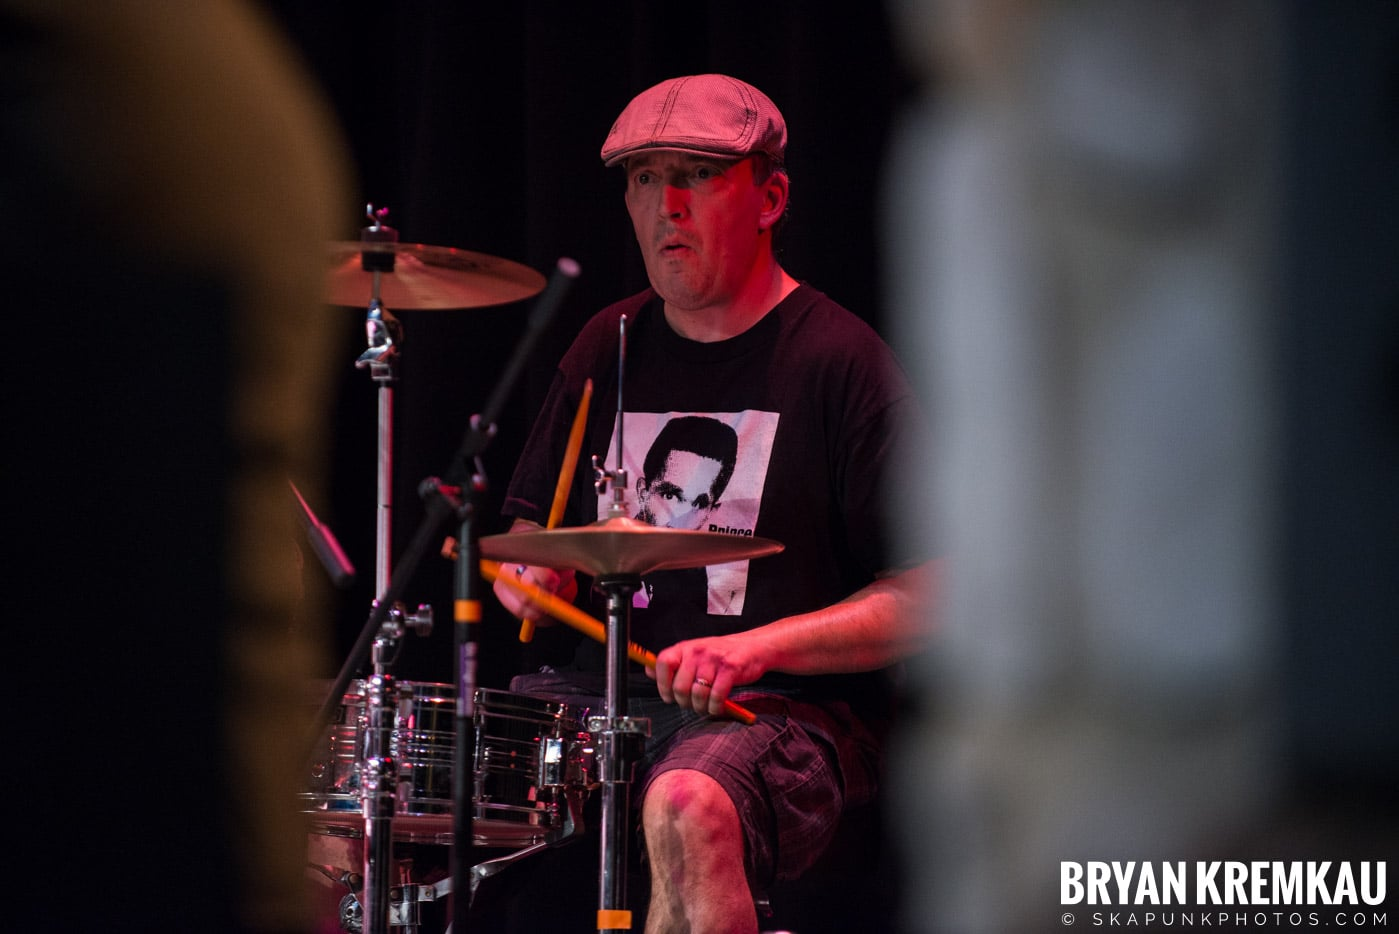 The Rudie Crew @ Oskar Schindler Performing Arts Center, West Orange, NJ - 8.19.17 (5)